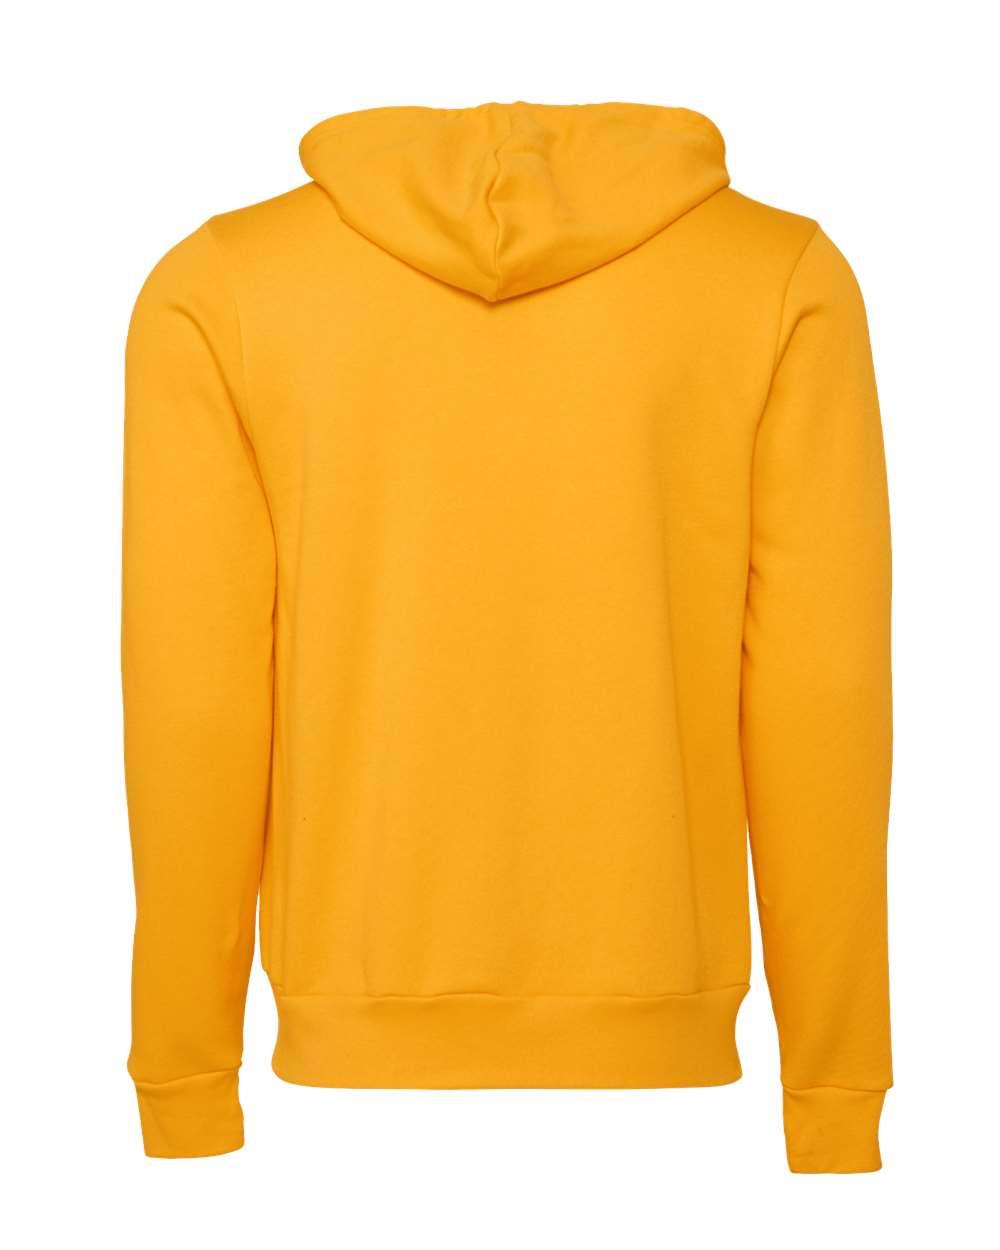 Bella-Canvas-Unisex-Full-Zip-Up-Hooded-Sweatshirt-Blank-Hoodie-3739-up-to-3XL thumbnail 33